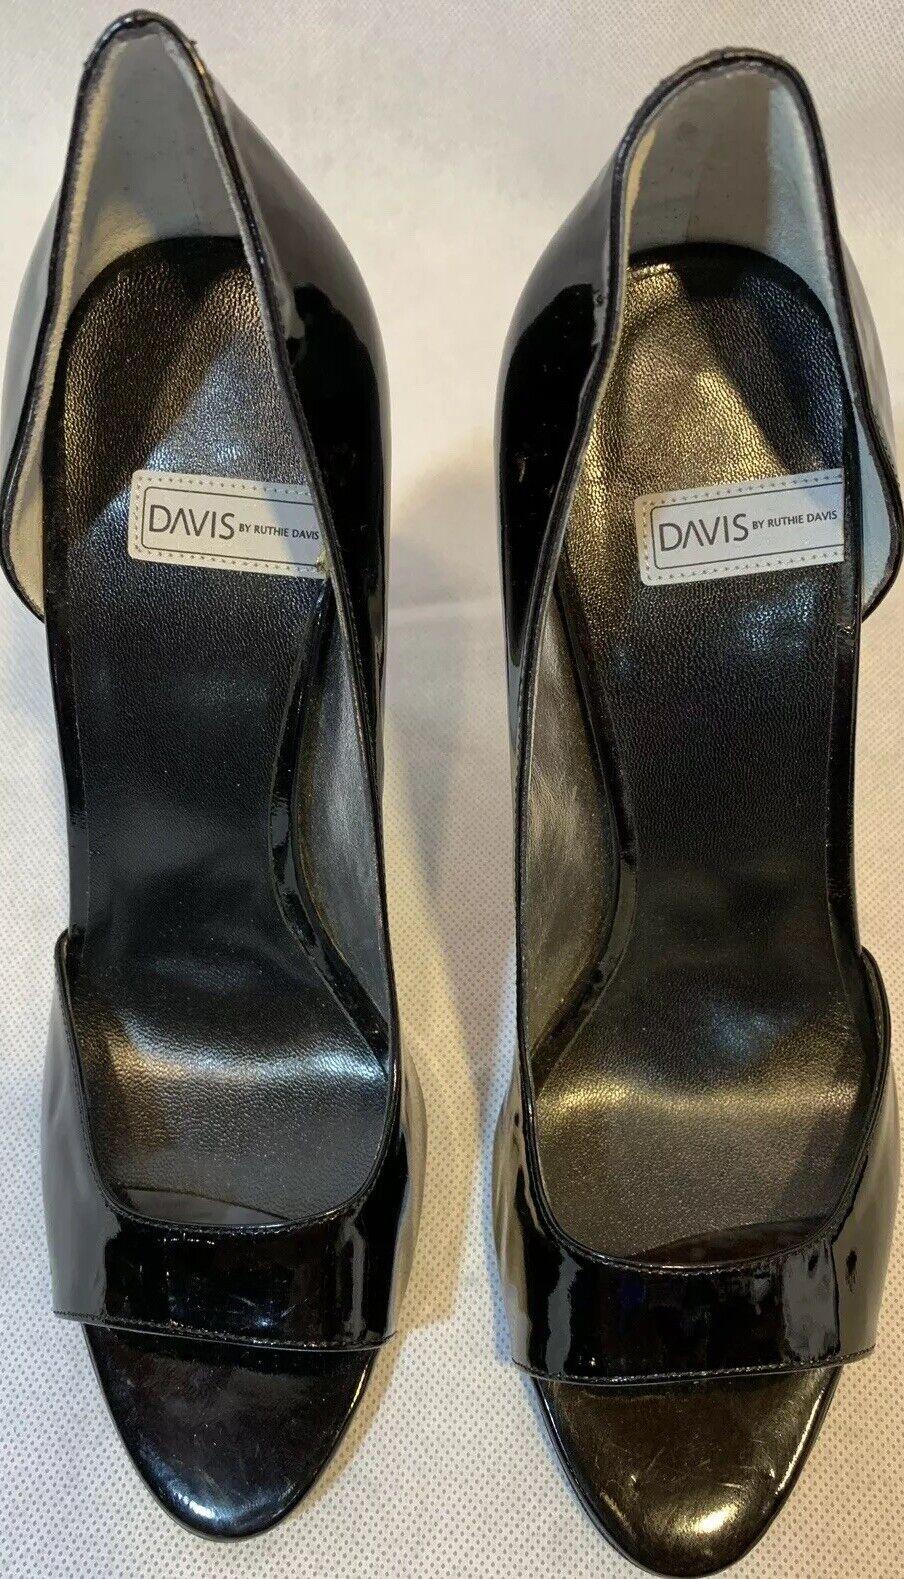 DAVIS By Ruthie Davis Black Patent Leather Peep Toe High Mirror Heel  EU37US7